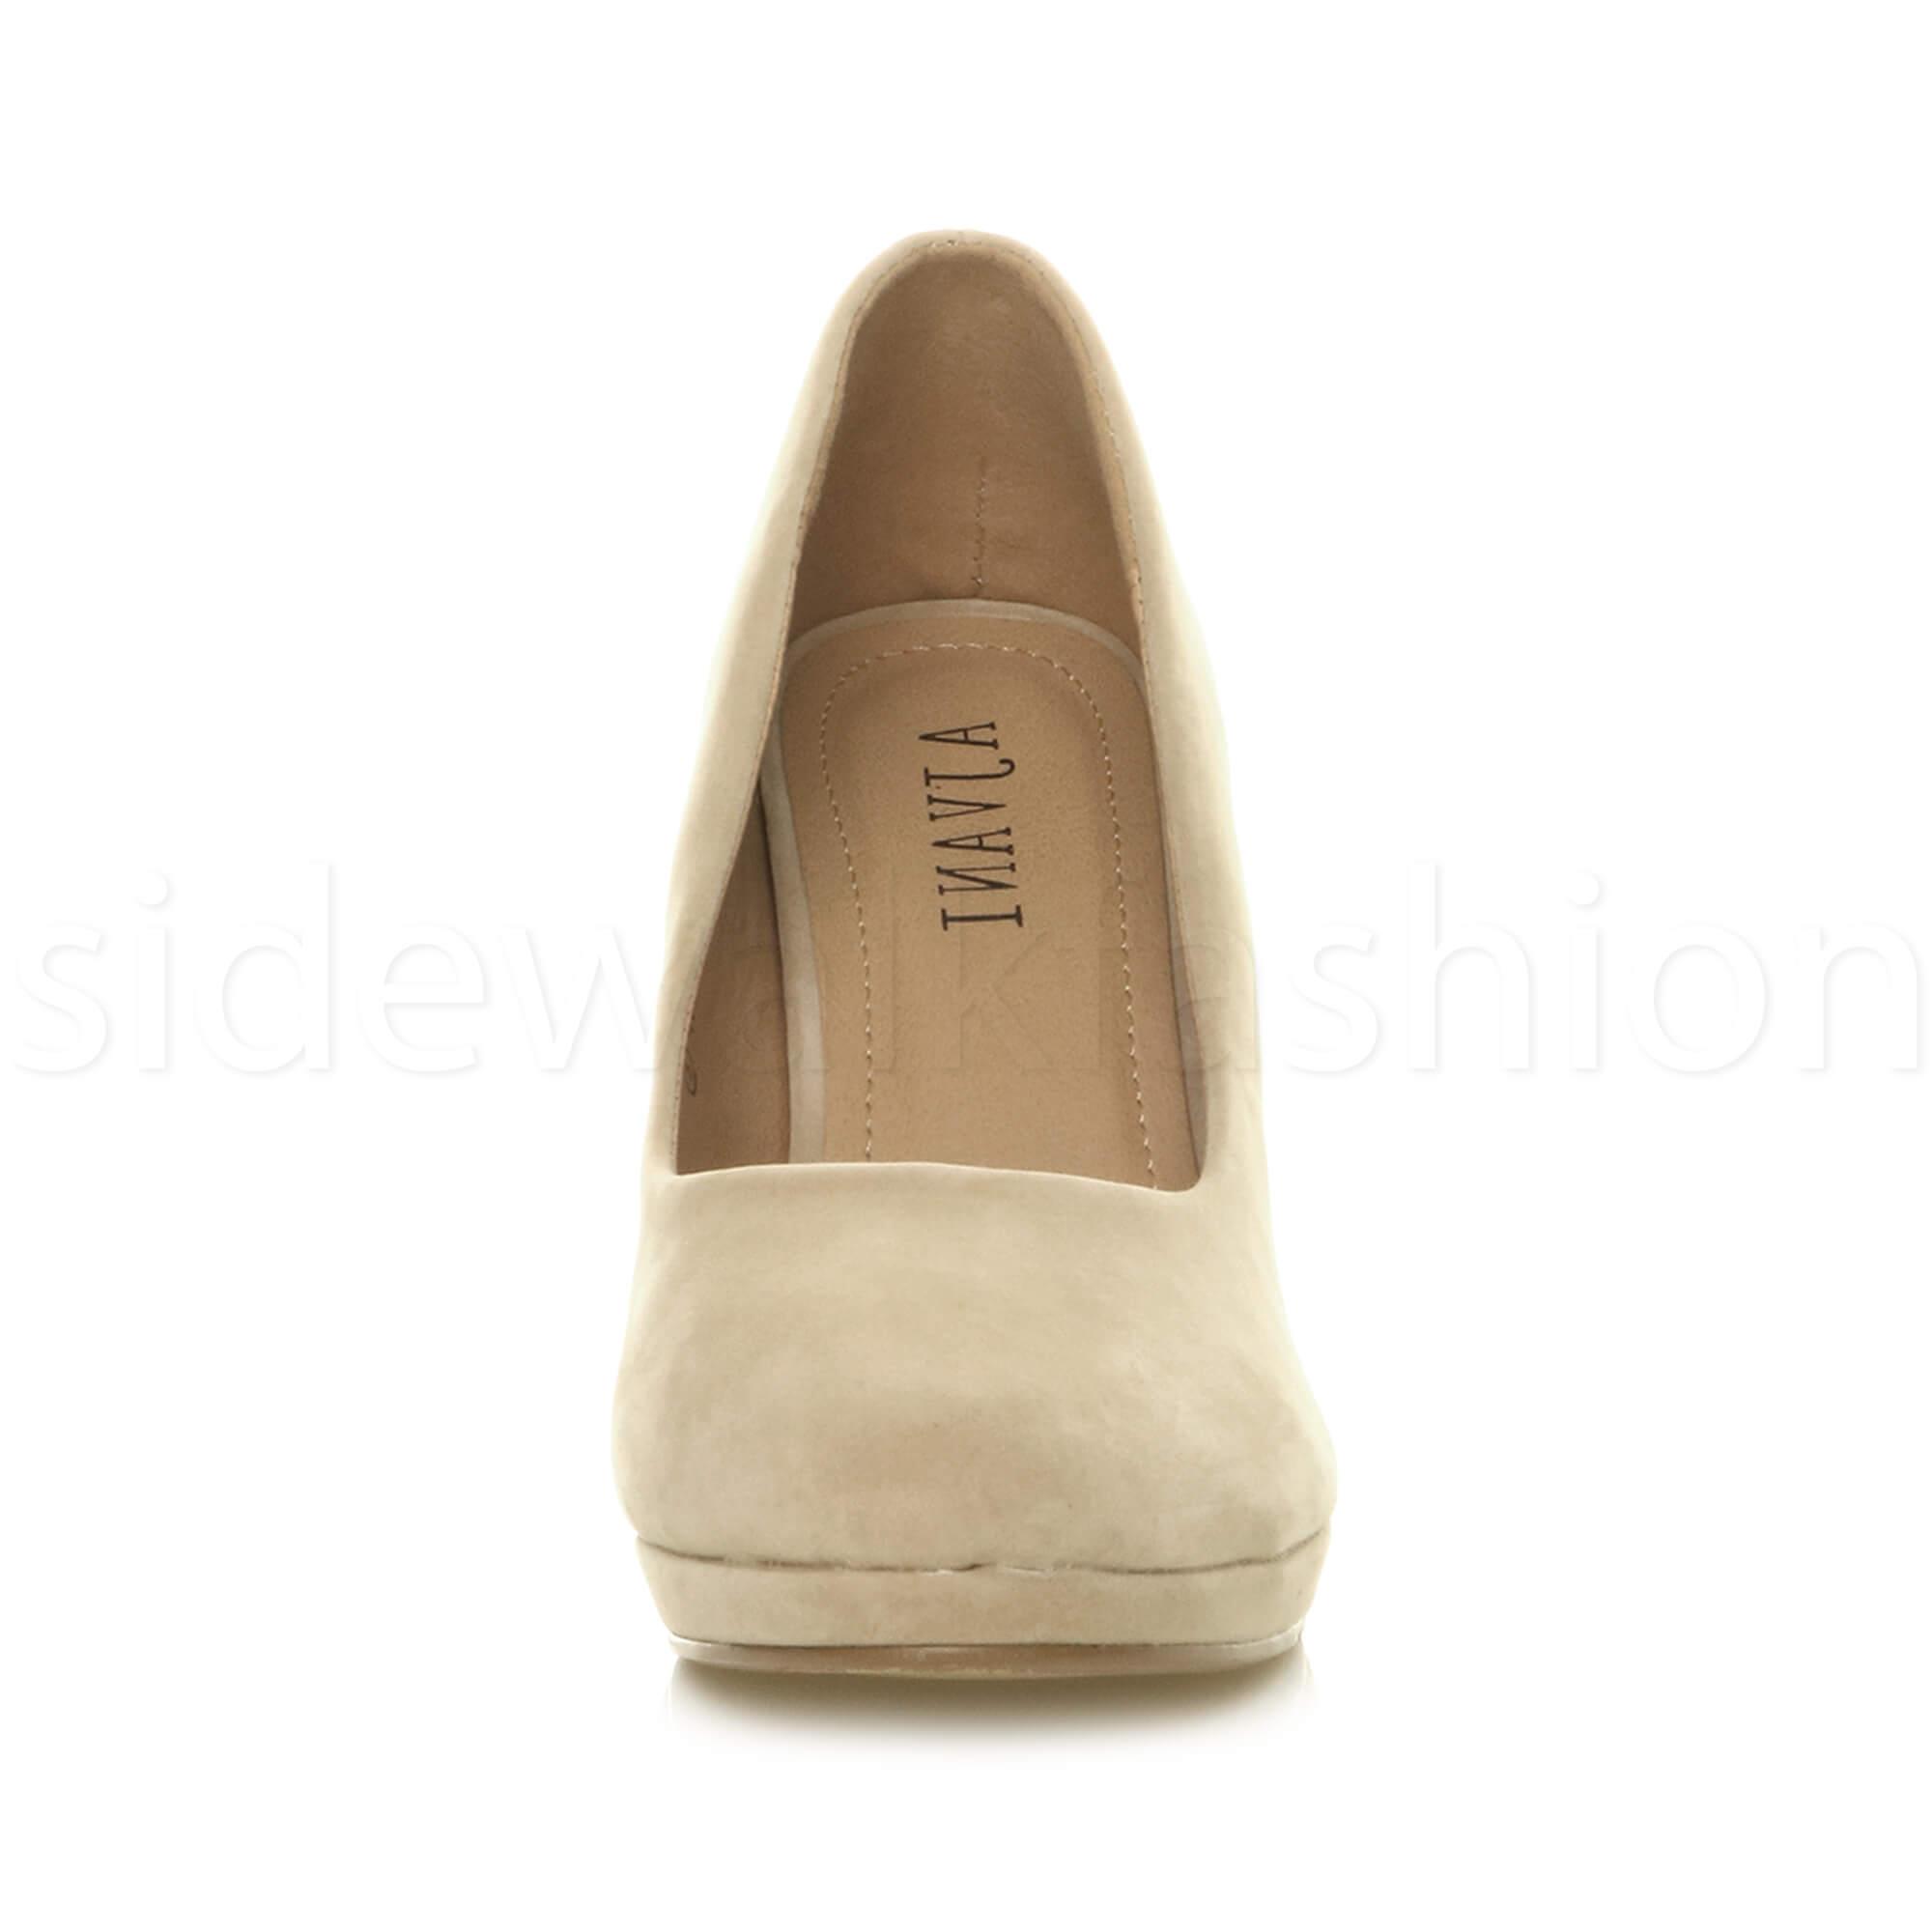 Womens-ladies-high-mid-heel-platform-wedding-evening-bridesmaid-court-shoes-size thumbnail 132